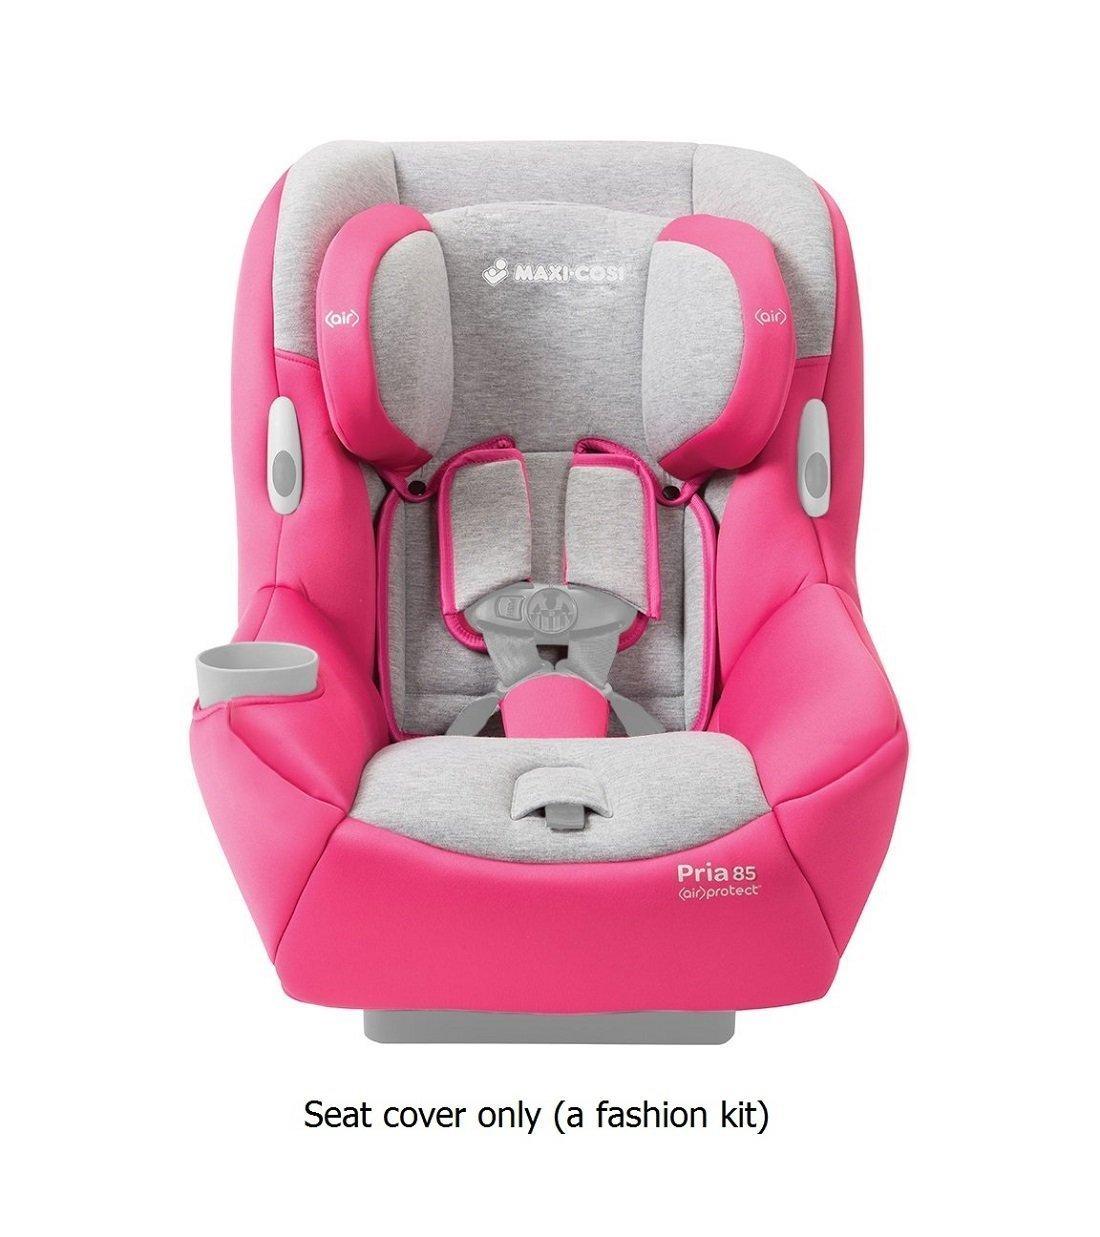 Maxi-Cosi Pria 85 Car Seat Fashion Kit, Passionate Pink (Car Seat Sold Separately)